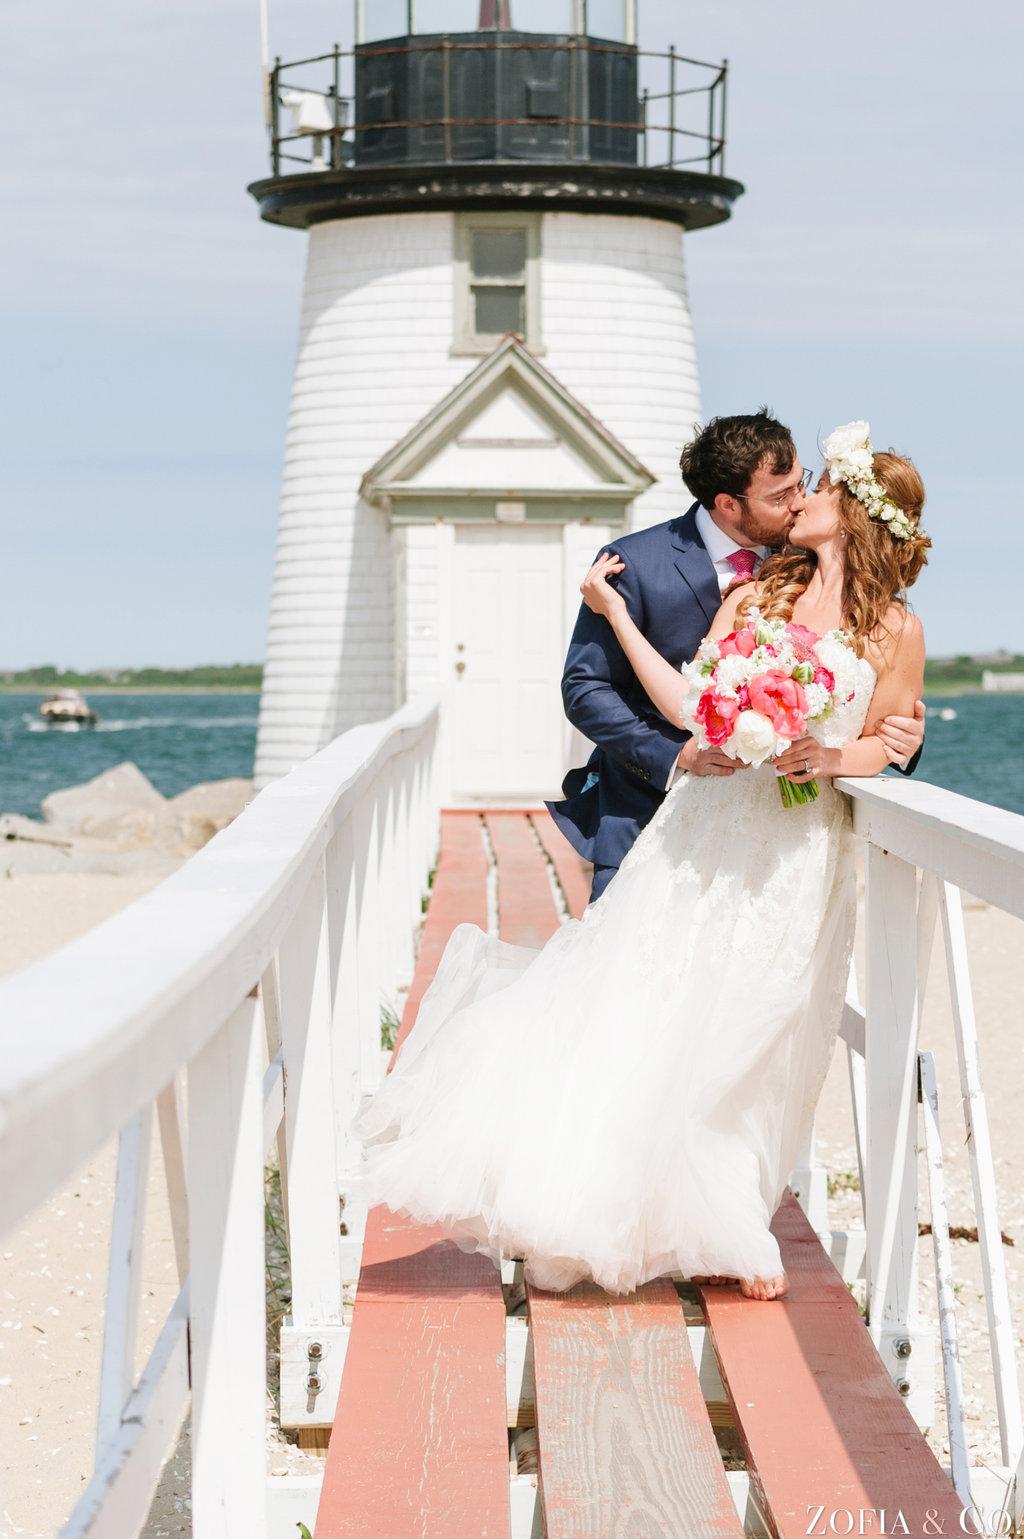 Ceci_New_York_Style_Luxury_Custom_Summer_Wedding_CeciBride_Nautical_Blue_Gold_Letterpress_Foil_45.jpg